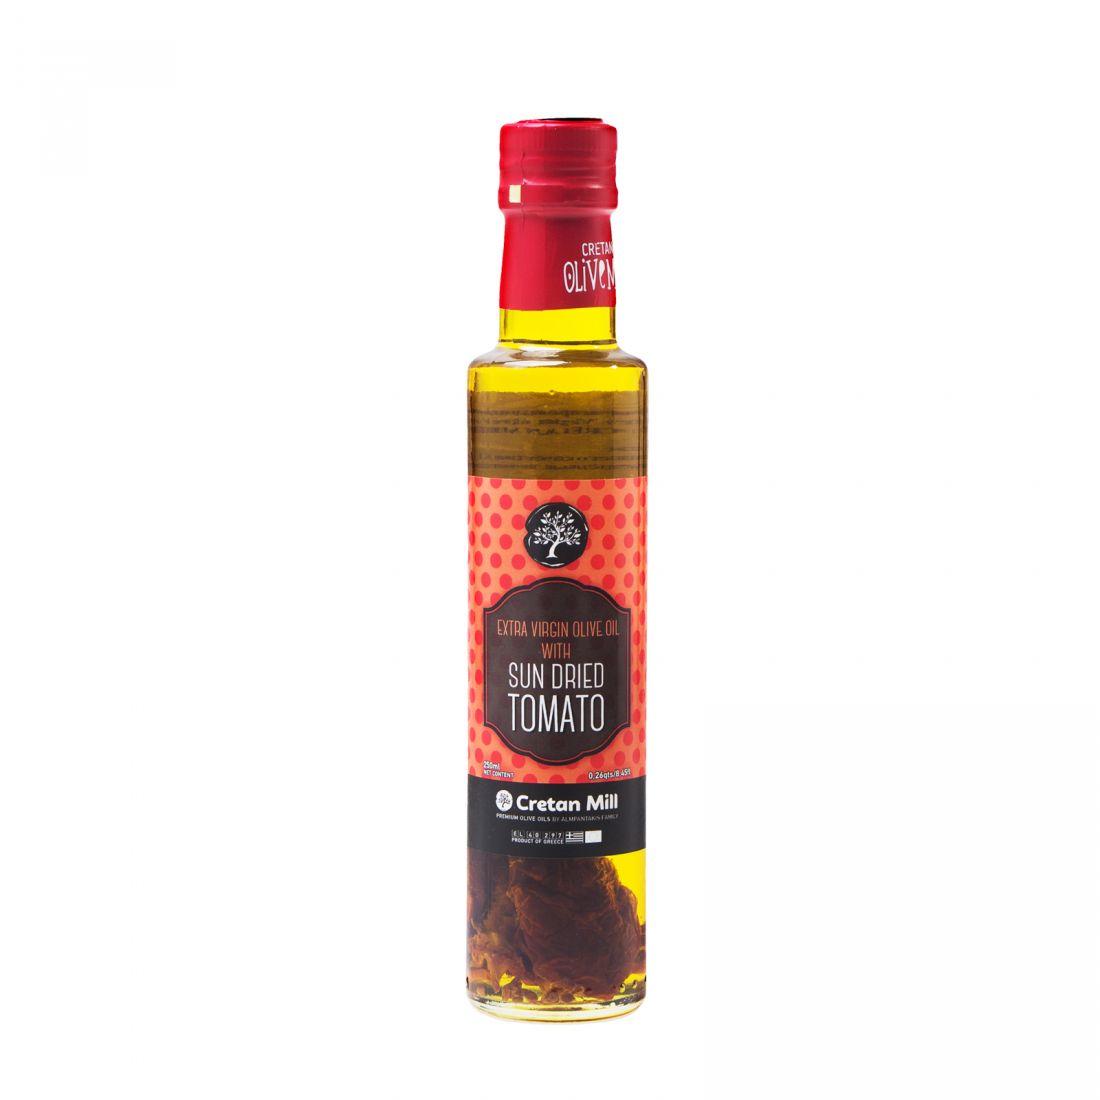 Оливковое масло с вялеными томатами CRETAN MILL  - 250 мл экстра вирджин